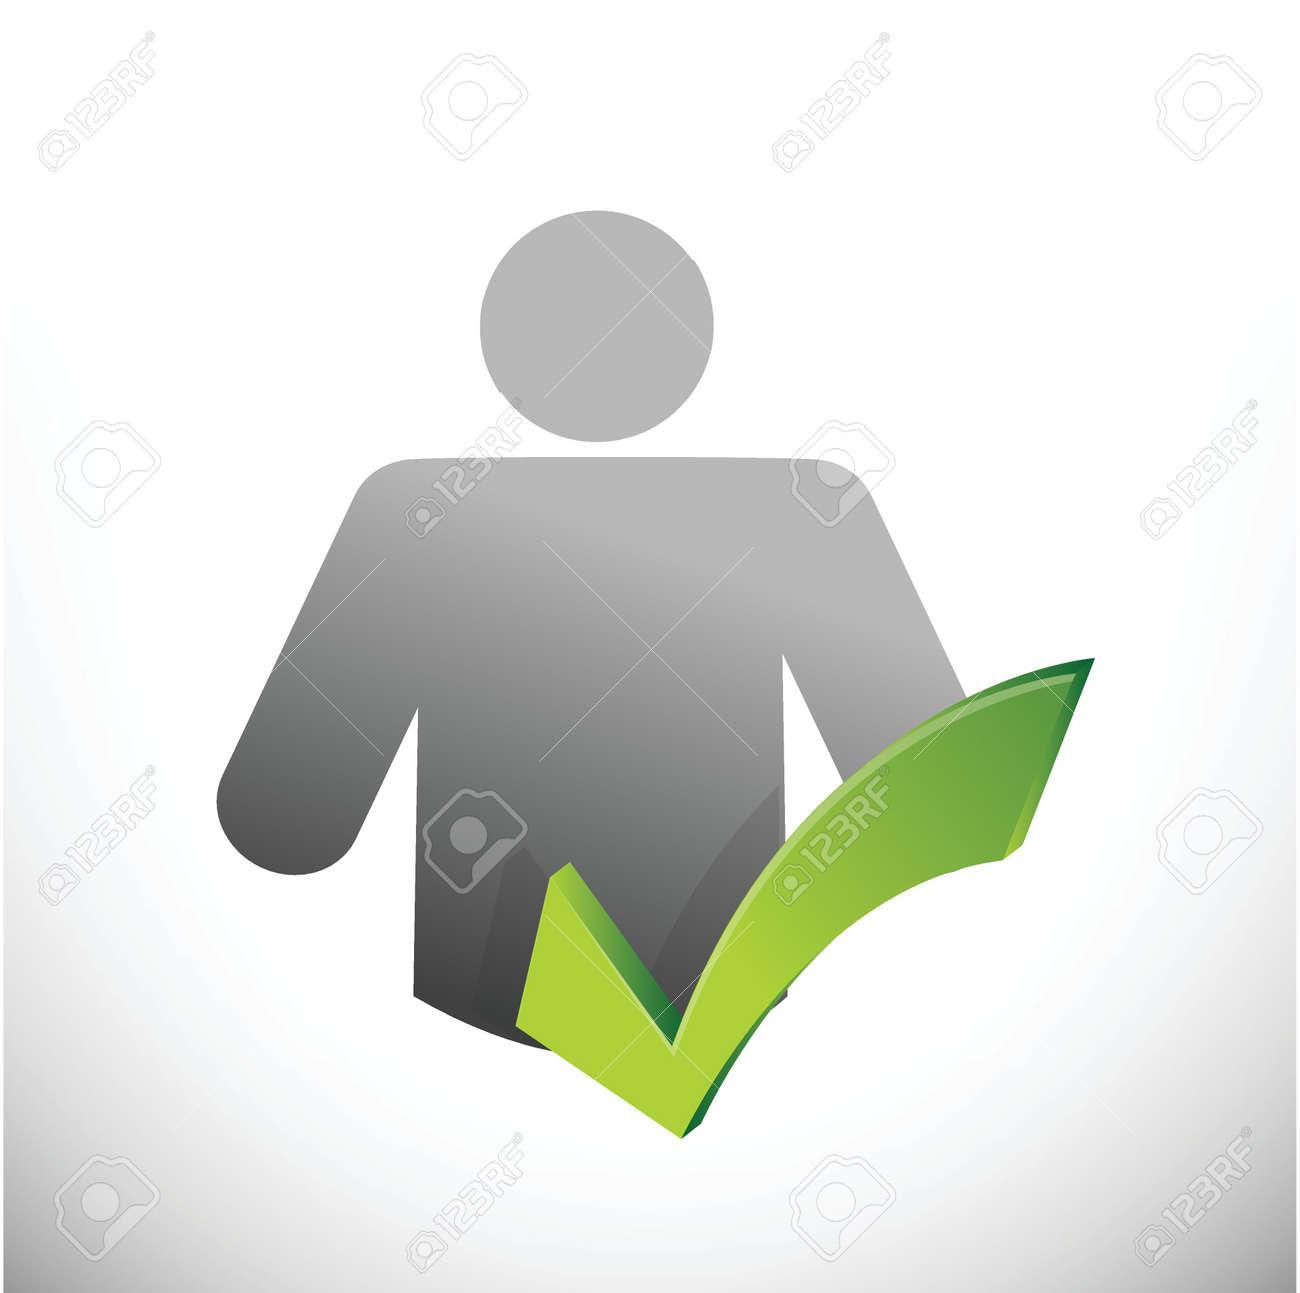 icon check mark illustration design over a white background Stock Vector - 22344477